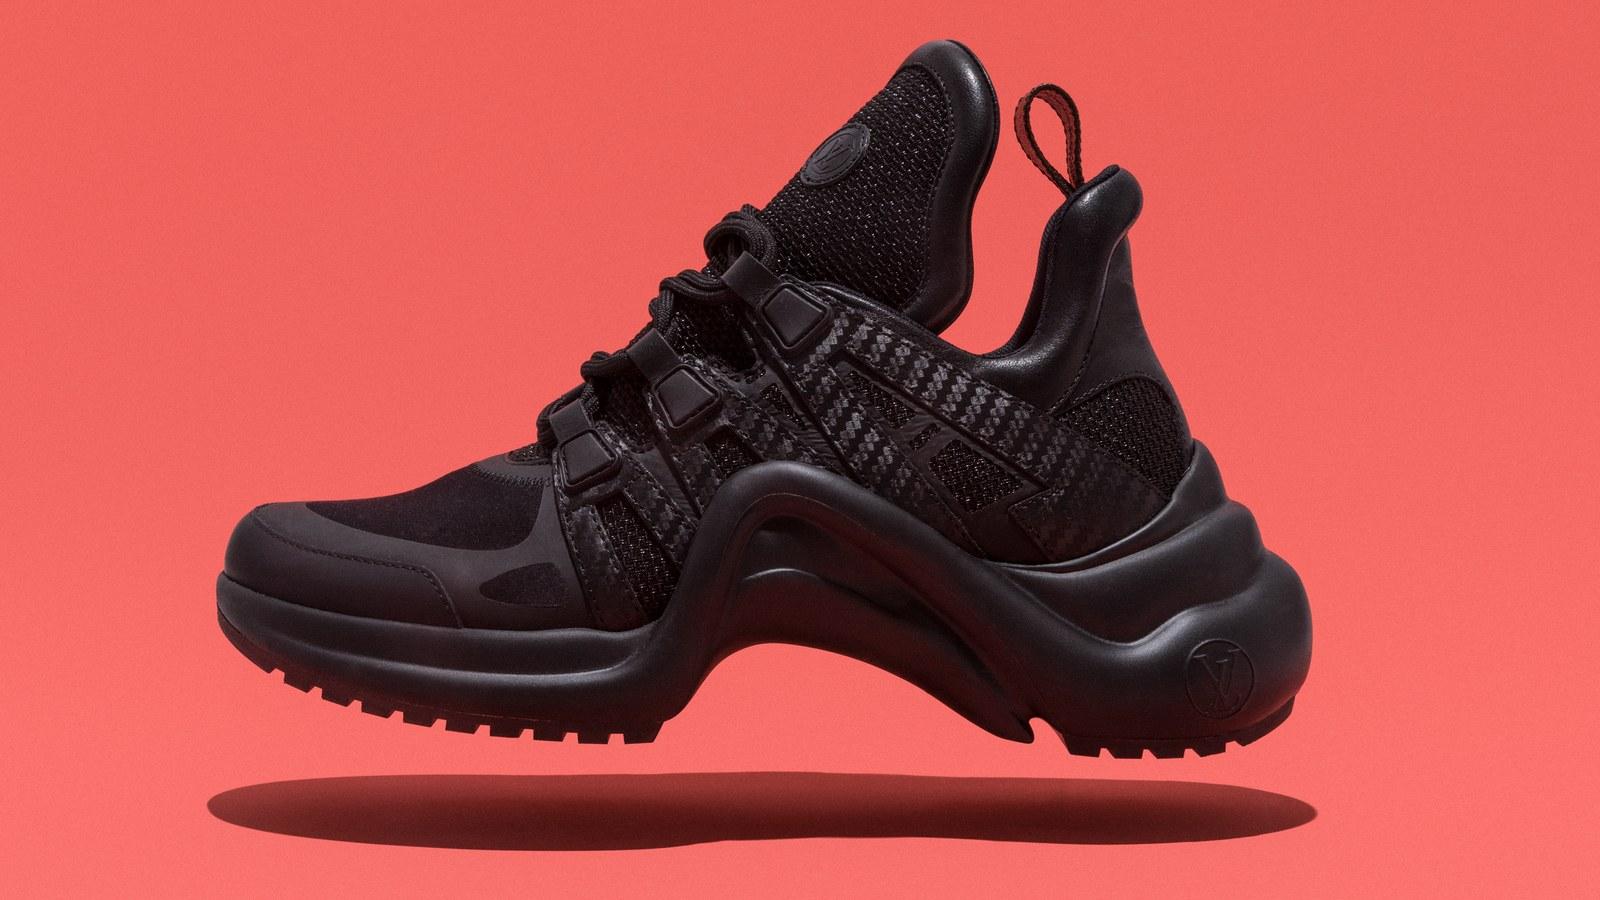 louis-vuitton-sneakers-01-3x2.jpg